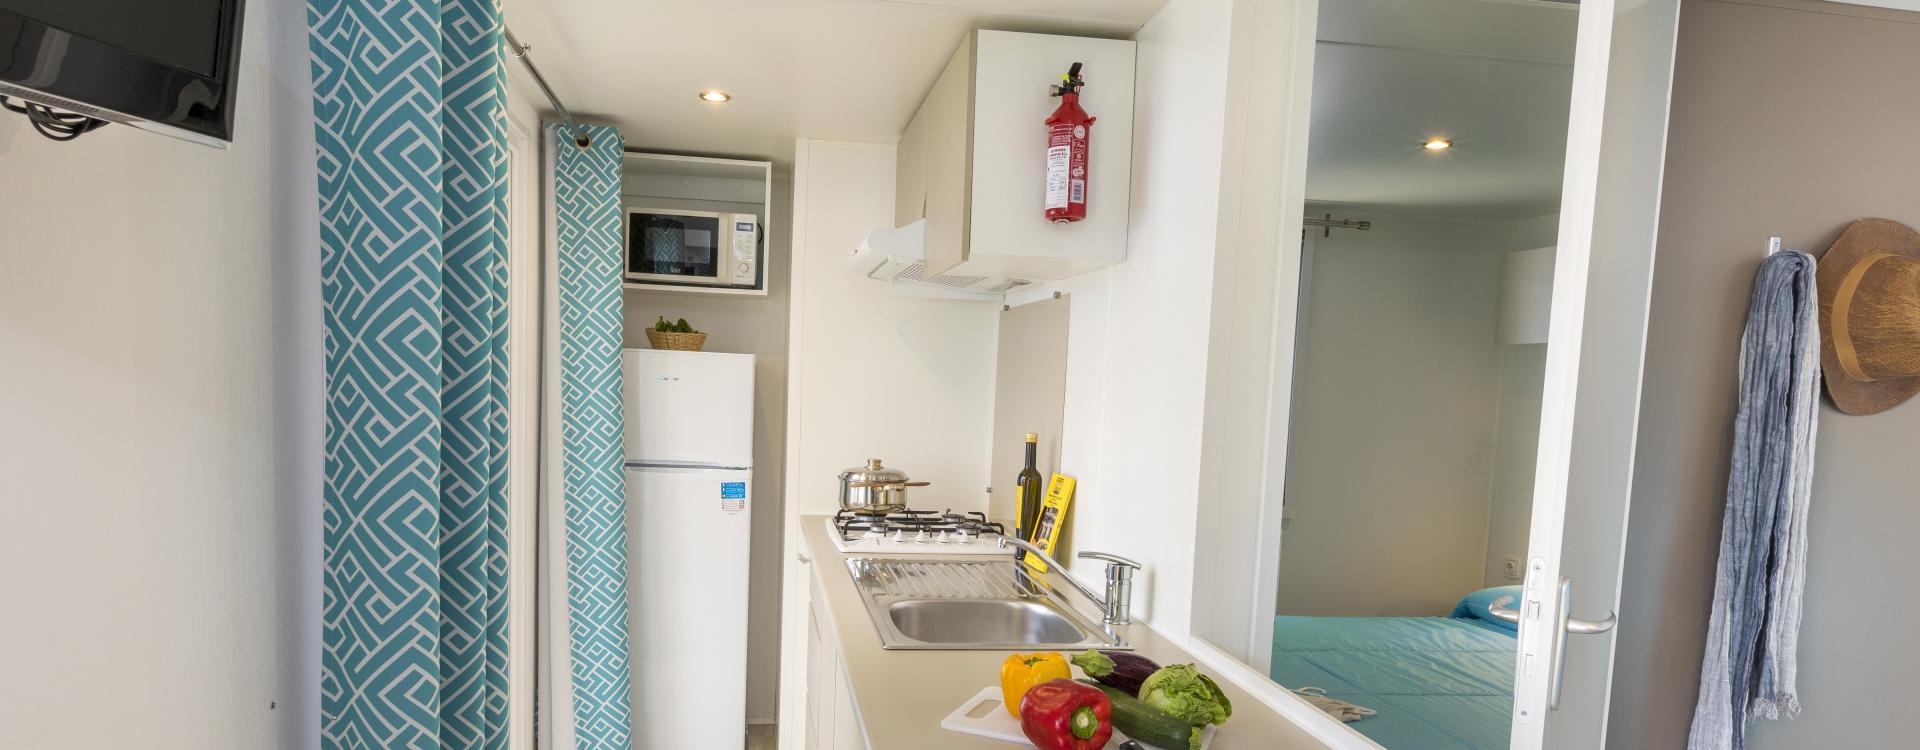 Uitgeruste keuken van Mobil Home Empordà - Camping Valldaro